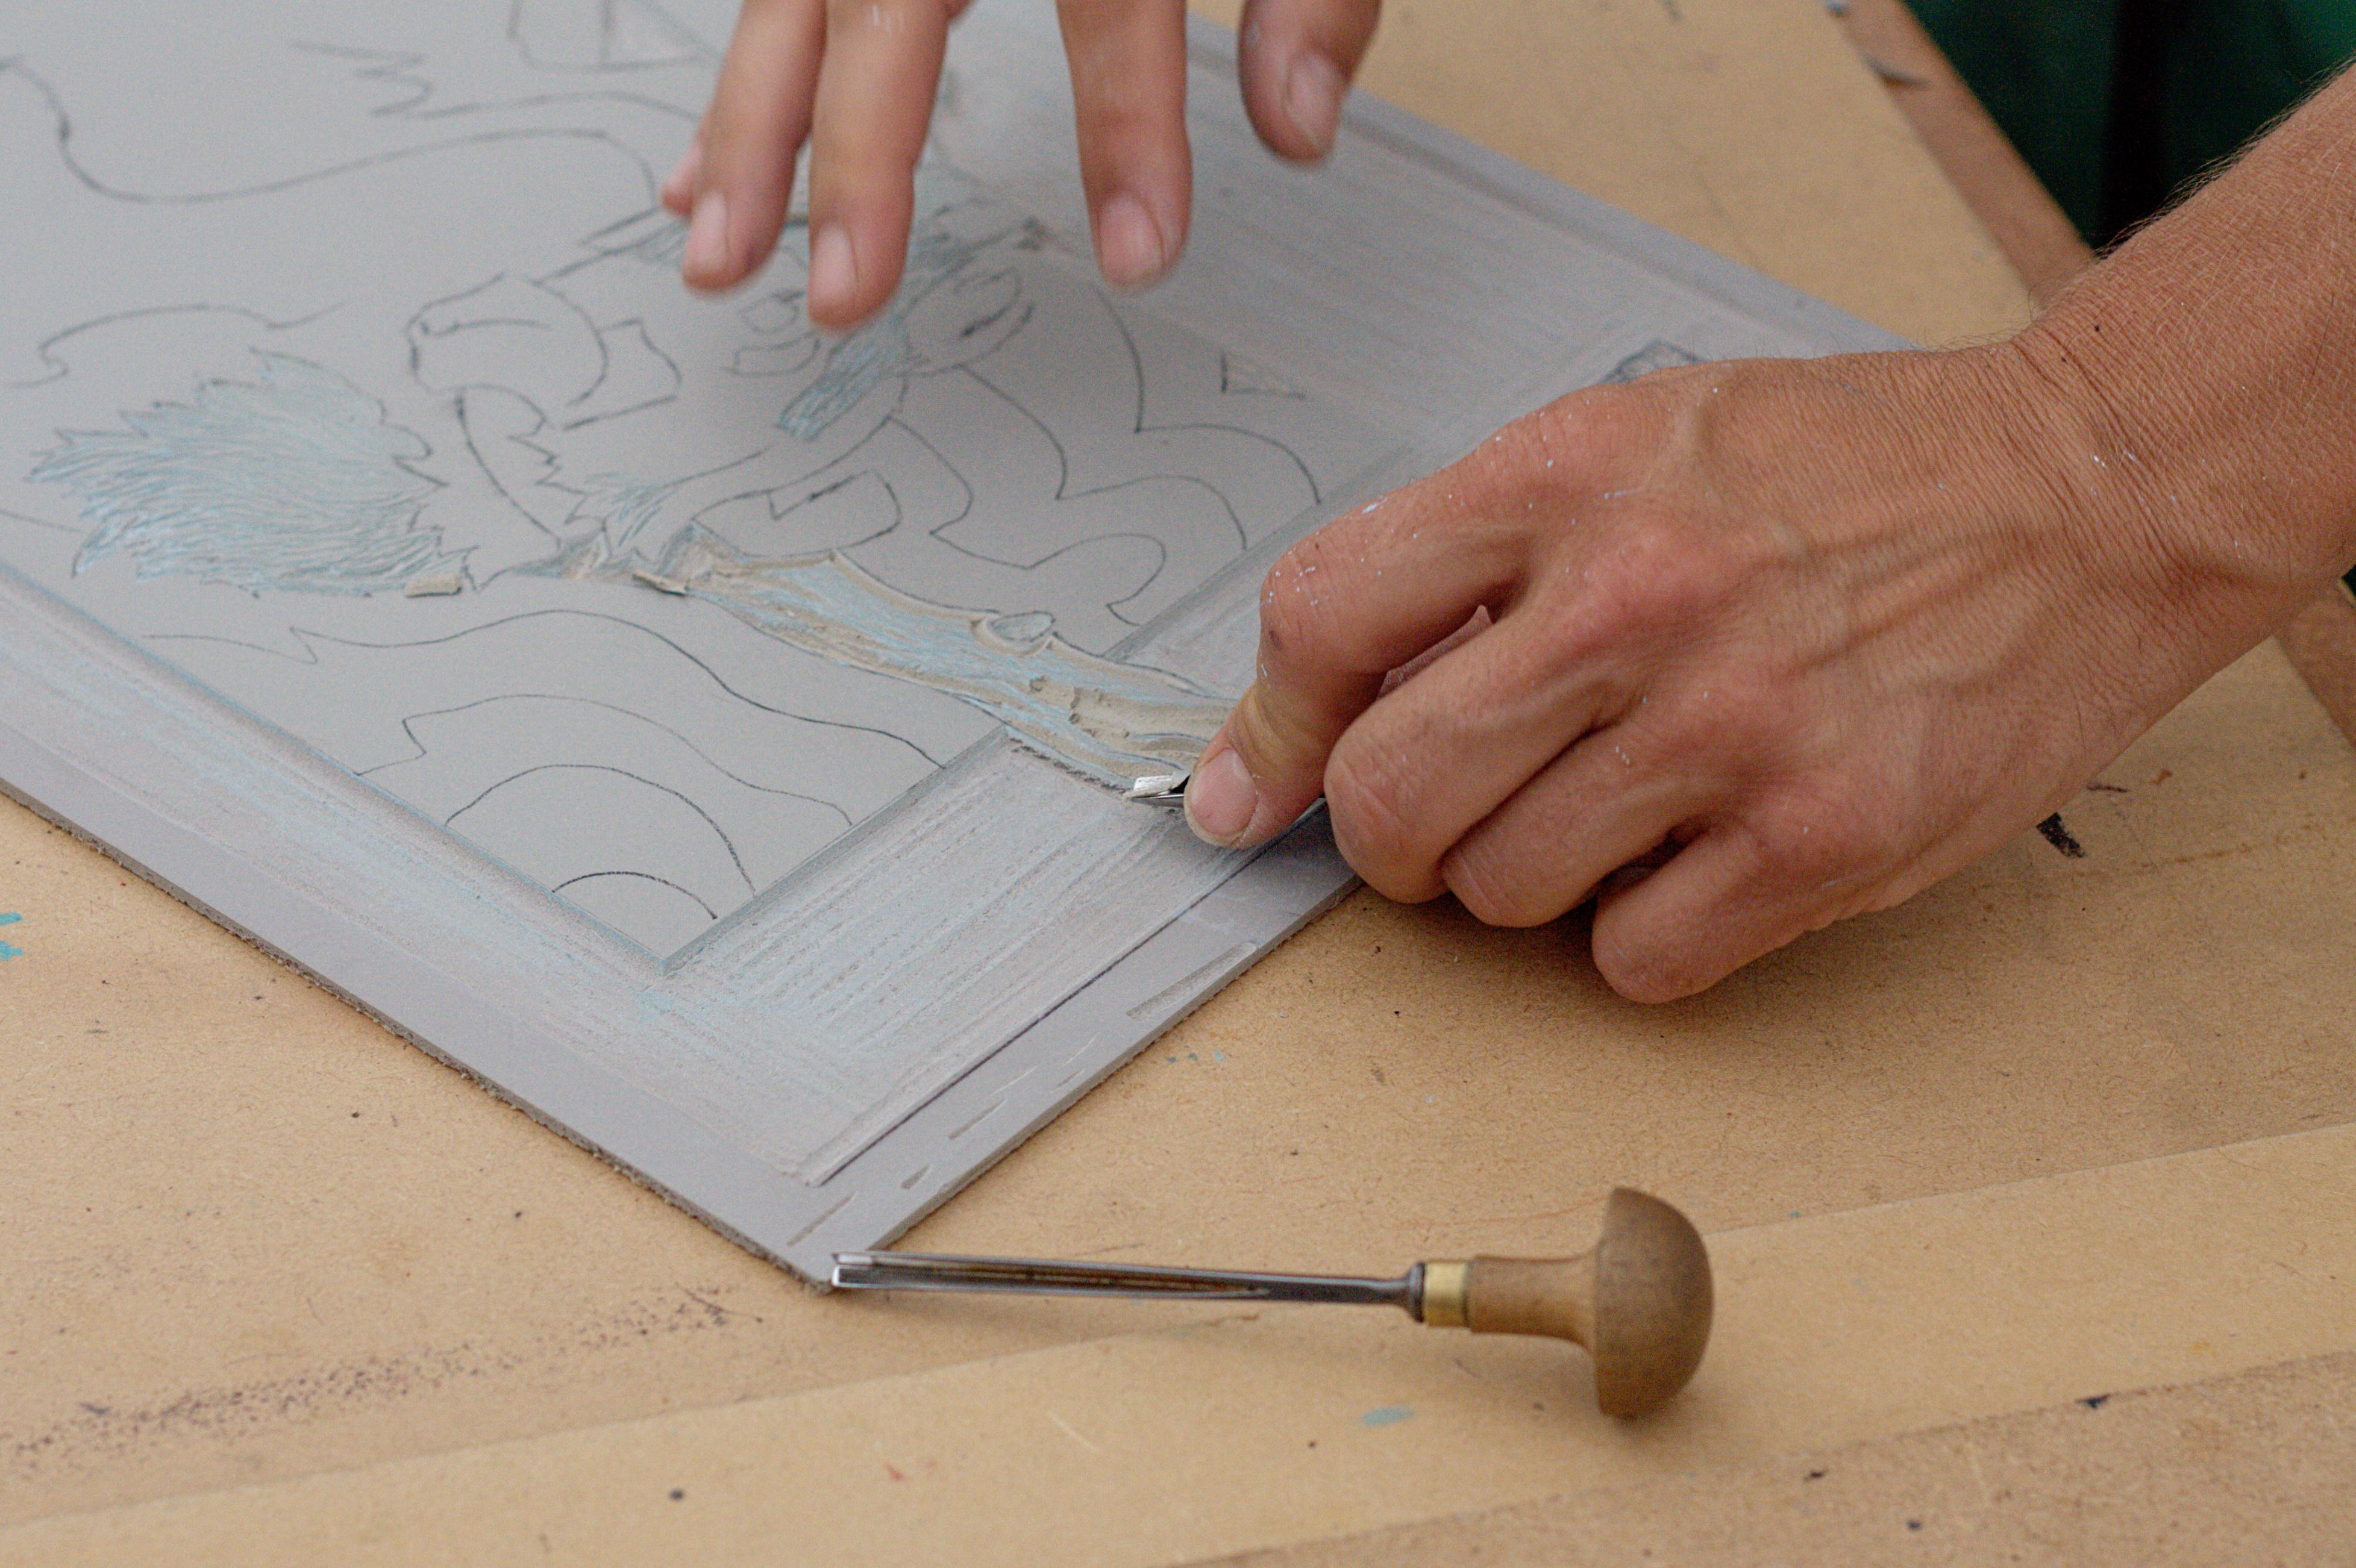 File:Preparing a Linocut Design.jpg - Wikimedia Commons